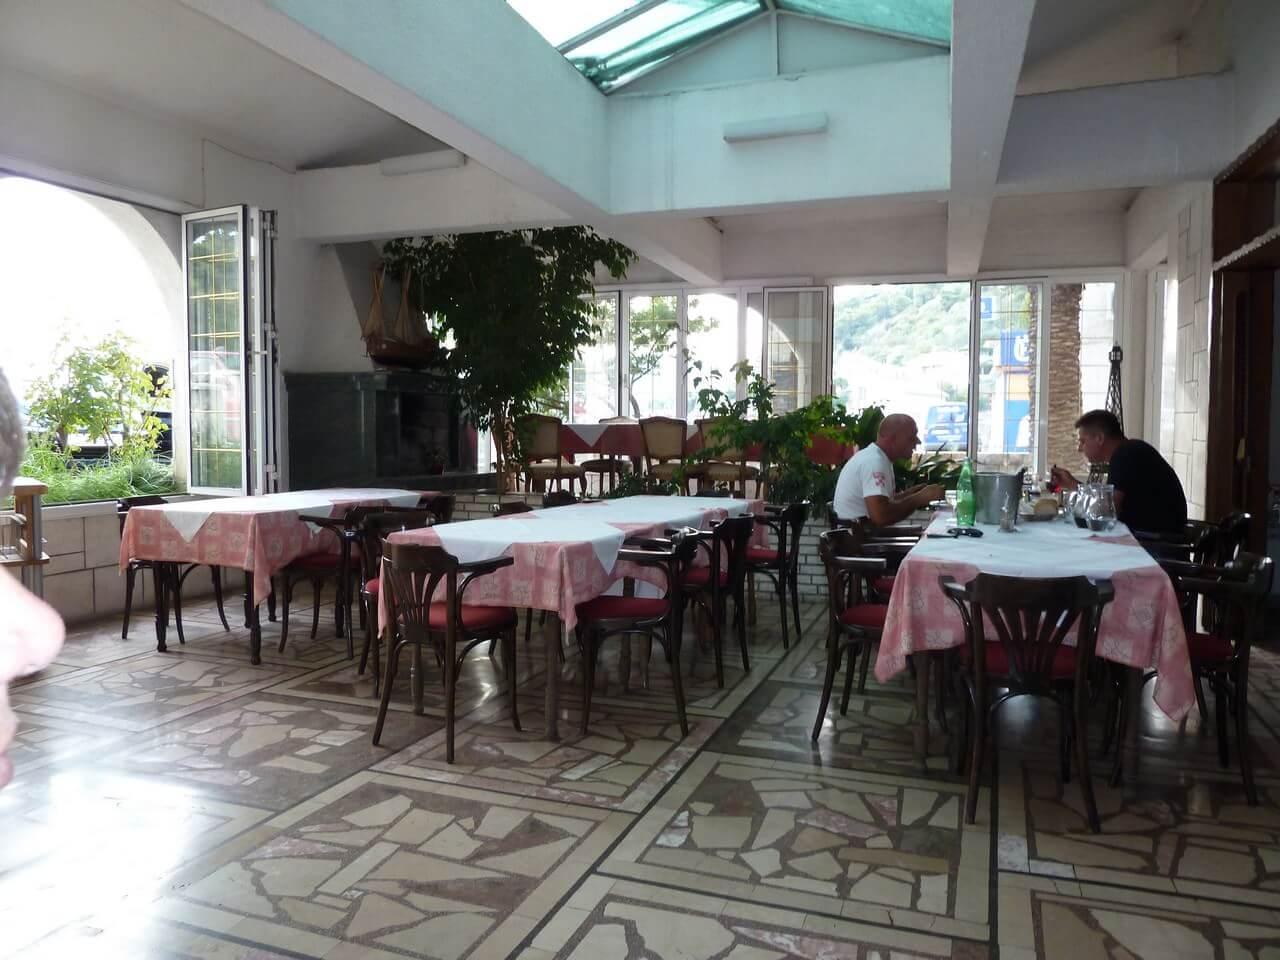 Restoran Monaco à Ploce